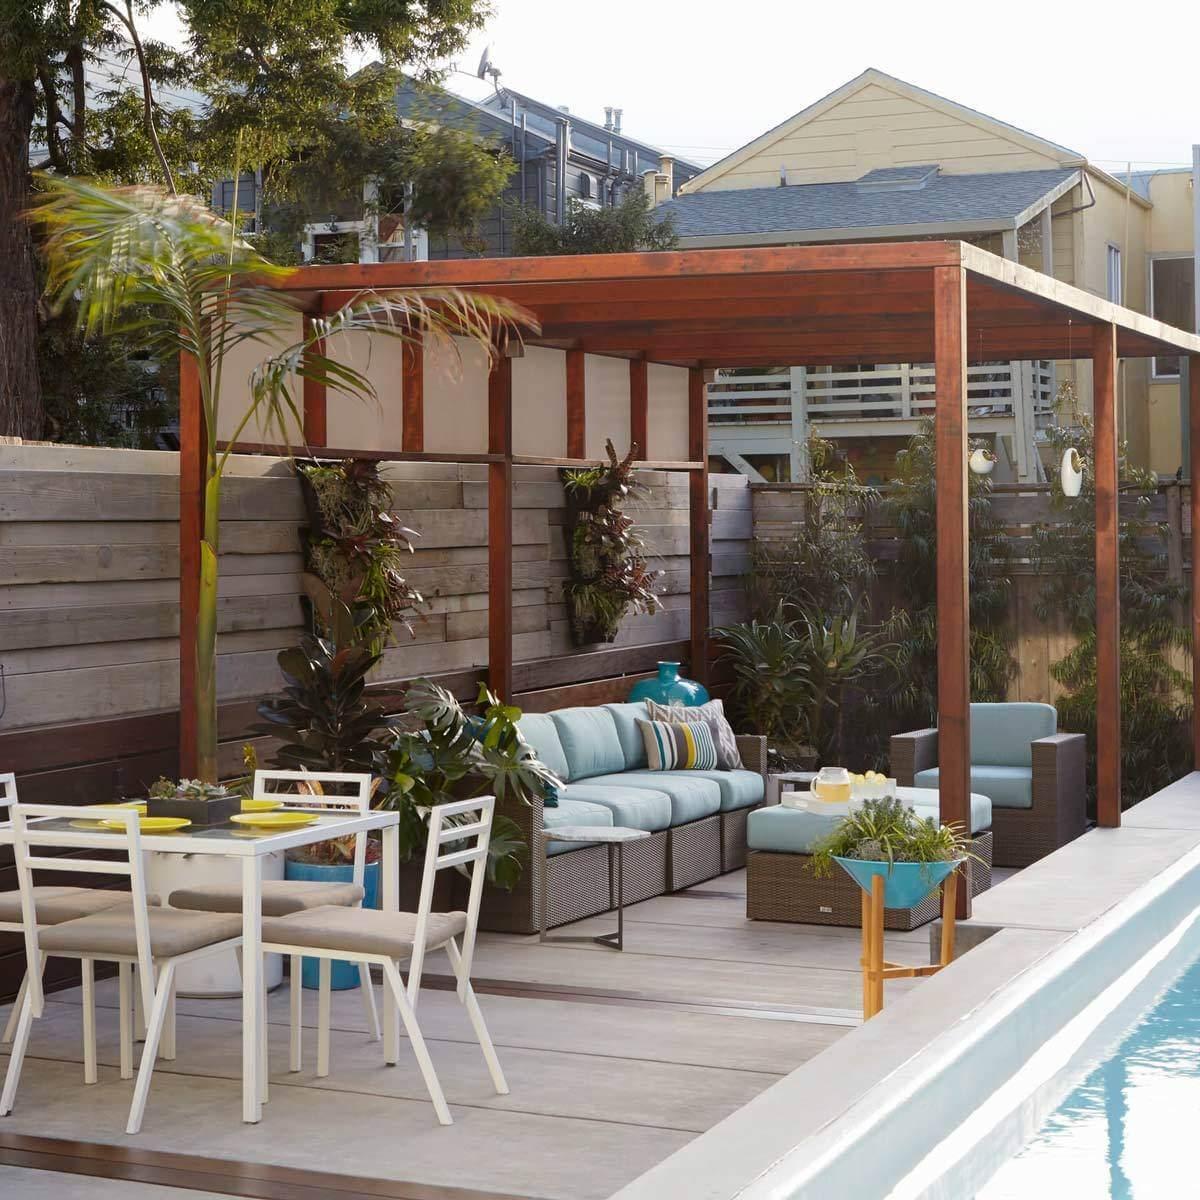 patio designs poolside patio with pergola VYFHCMT